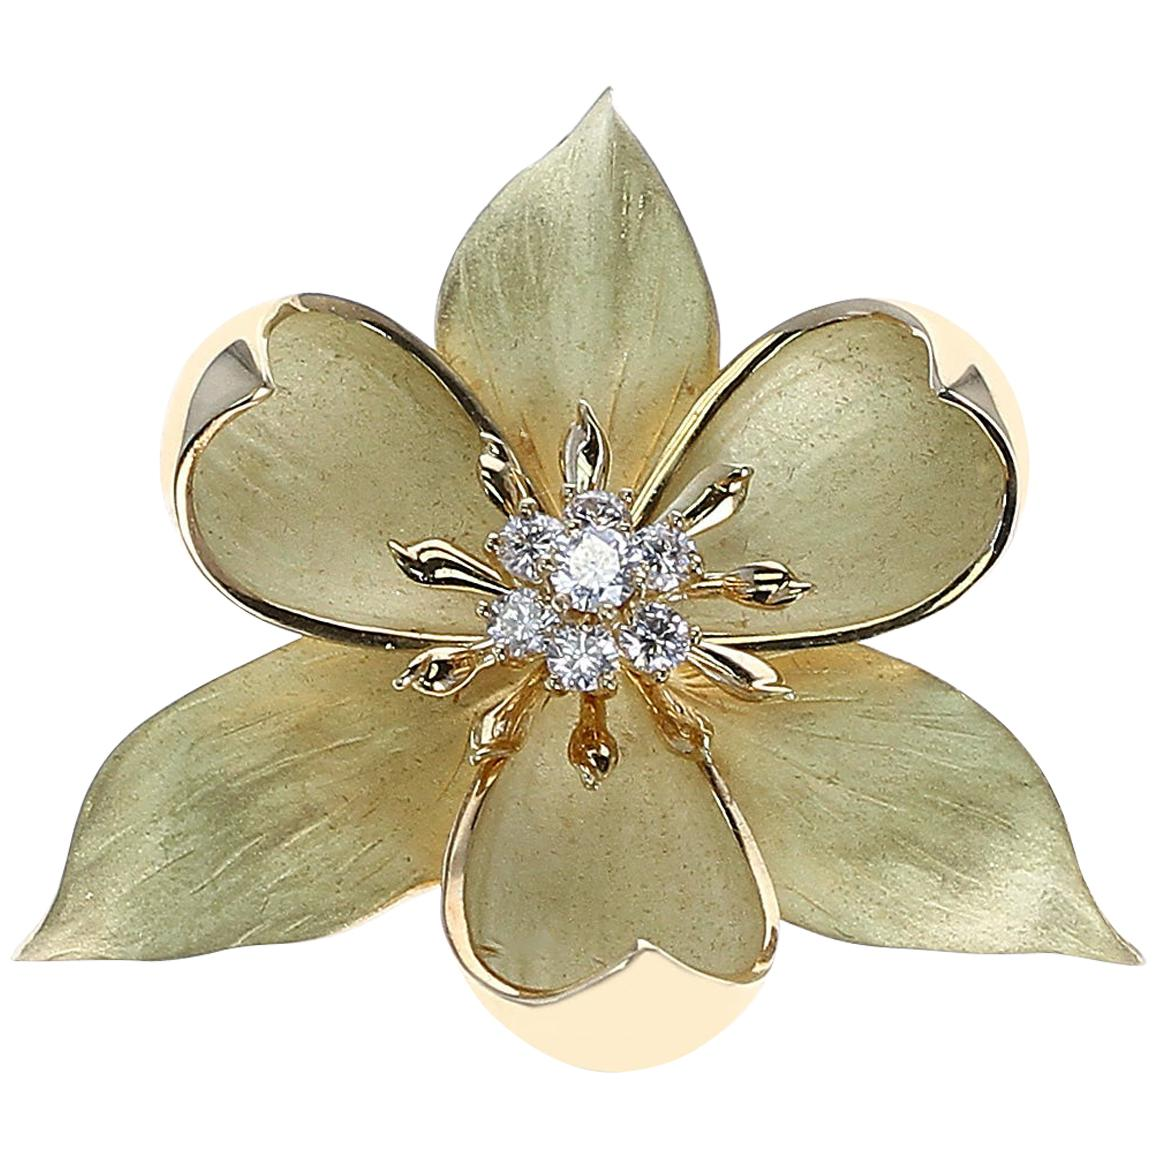 Tiffany & Co. Floral Diamond Brooch, 18 Karat Yellow Gold